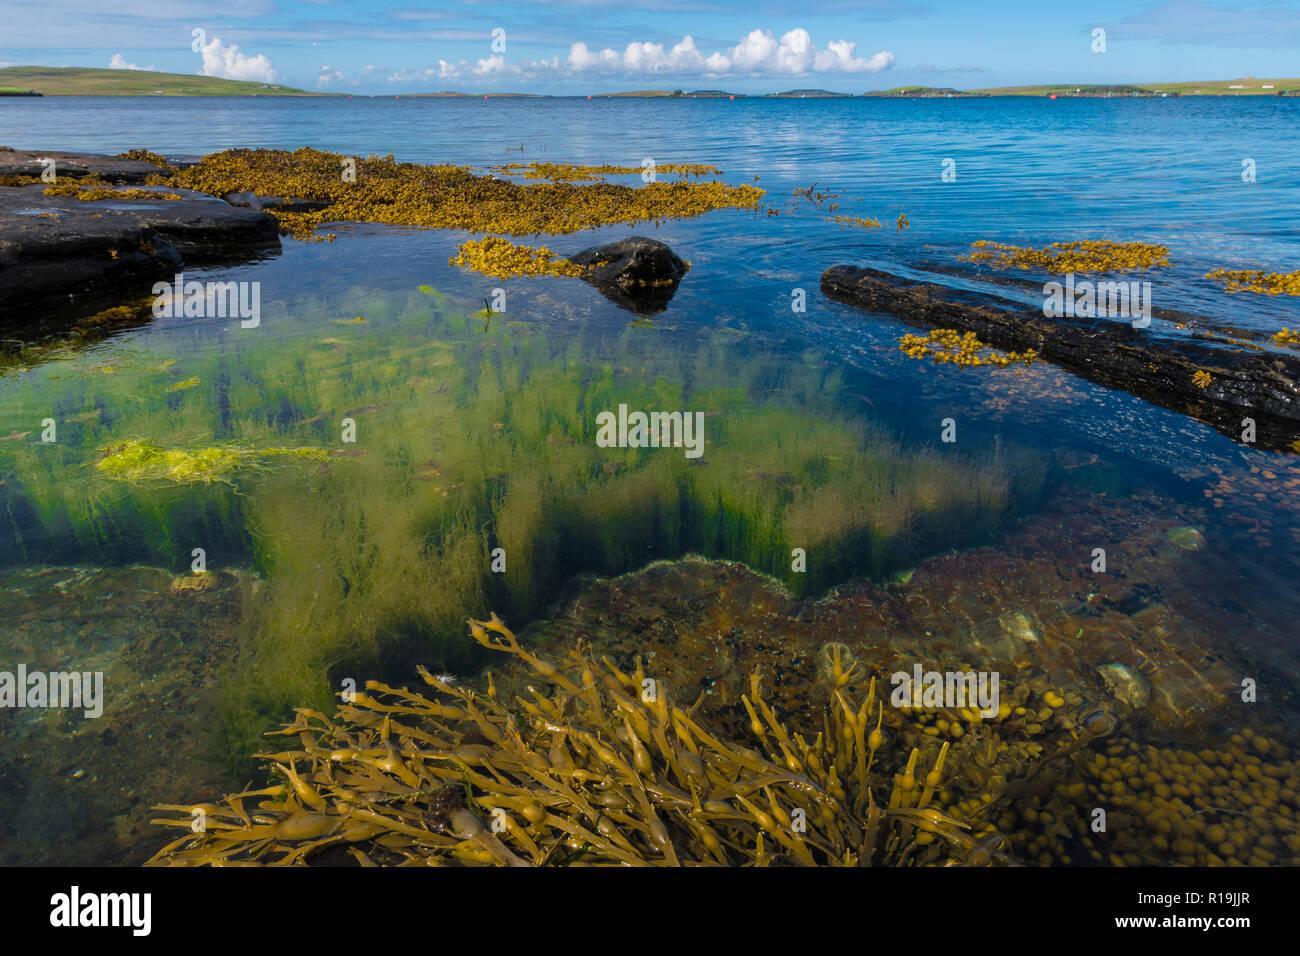 Pristine inshore habitat with Kelp on Rousay, Orkney - Stock Image